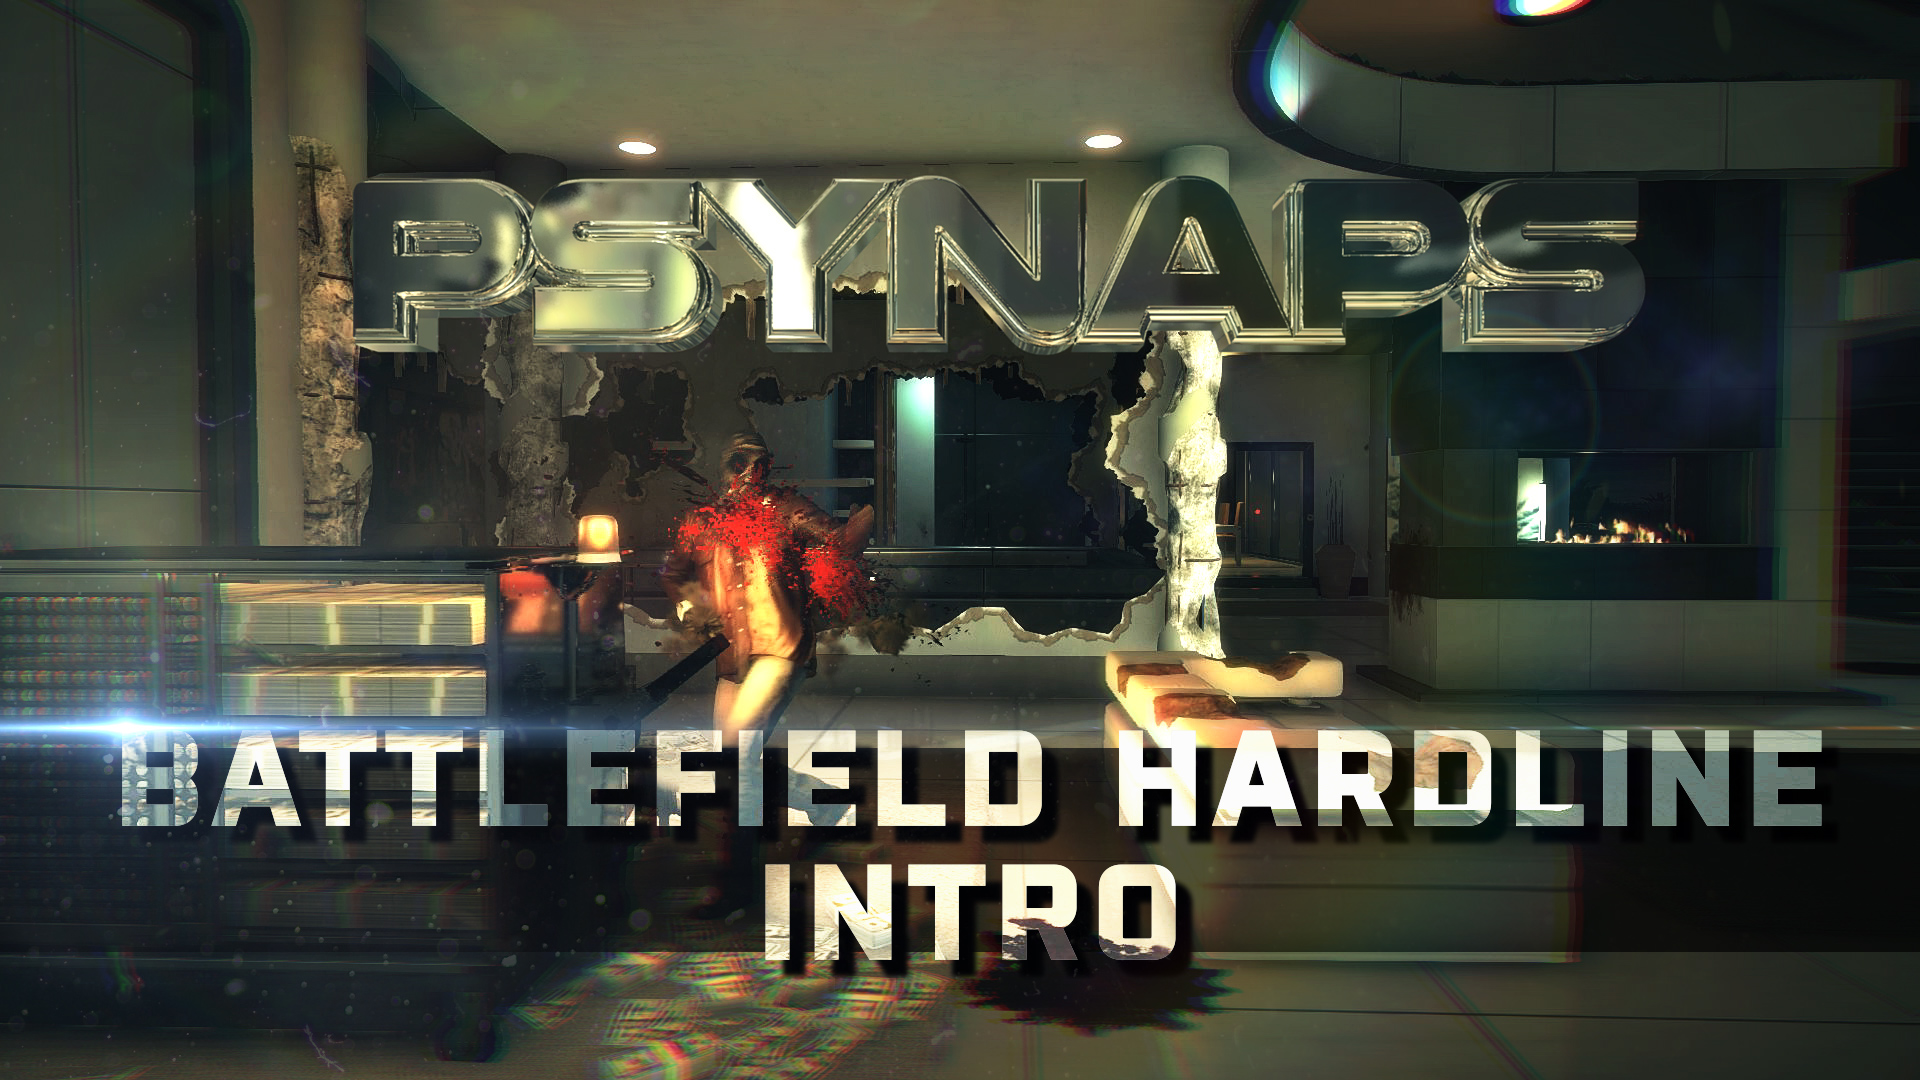 Battlefield Hardline Custom Intro: Hollywood Heights Blood Money by Psynaps